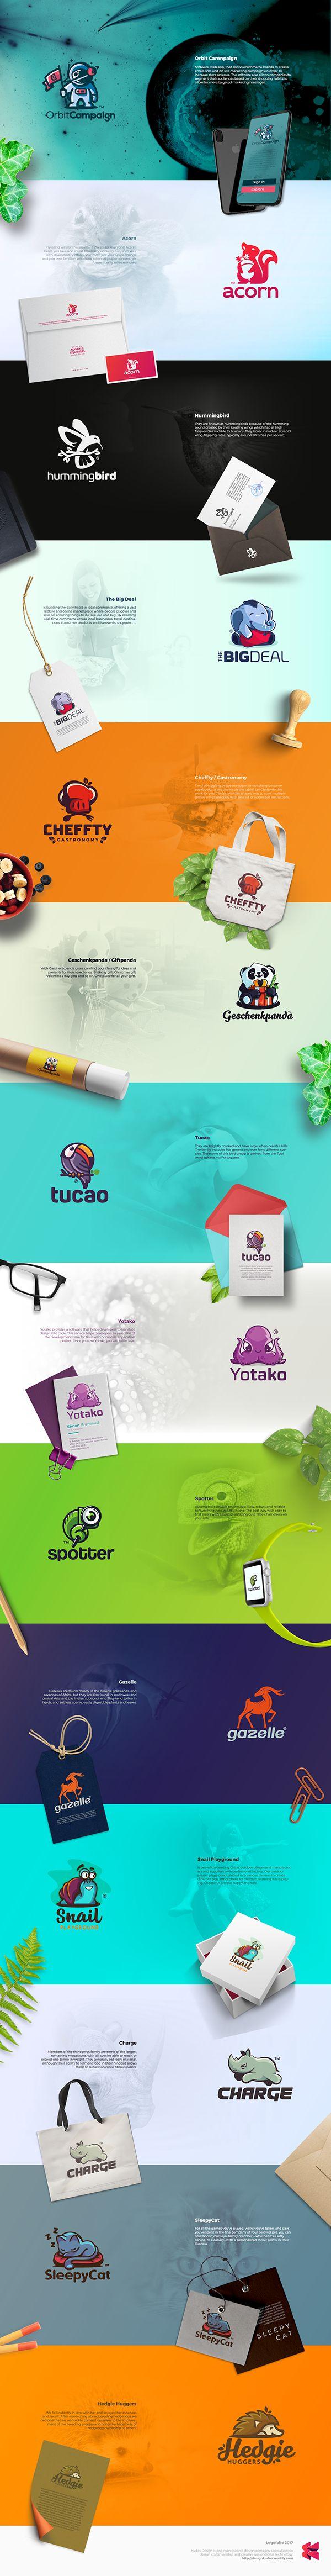 Logofolio 2017 on Behance